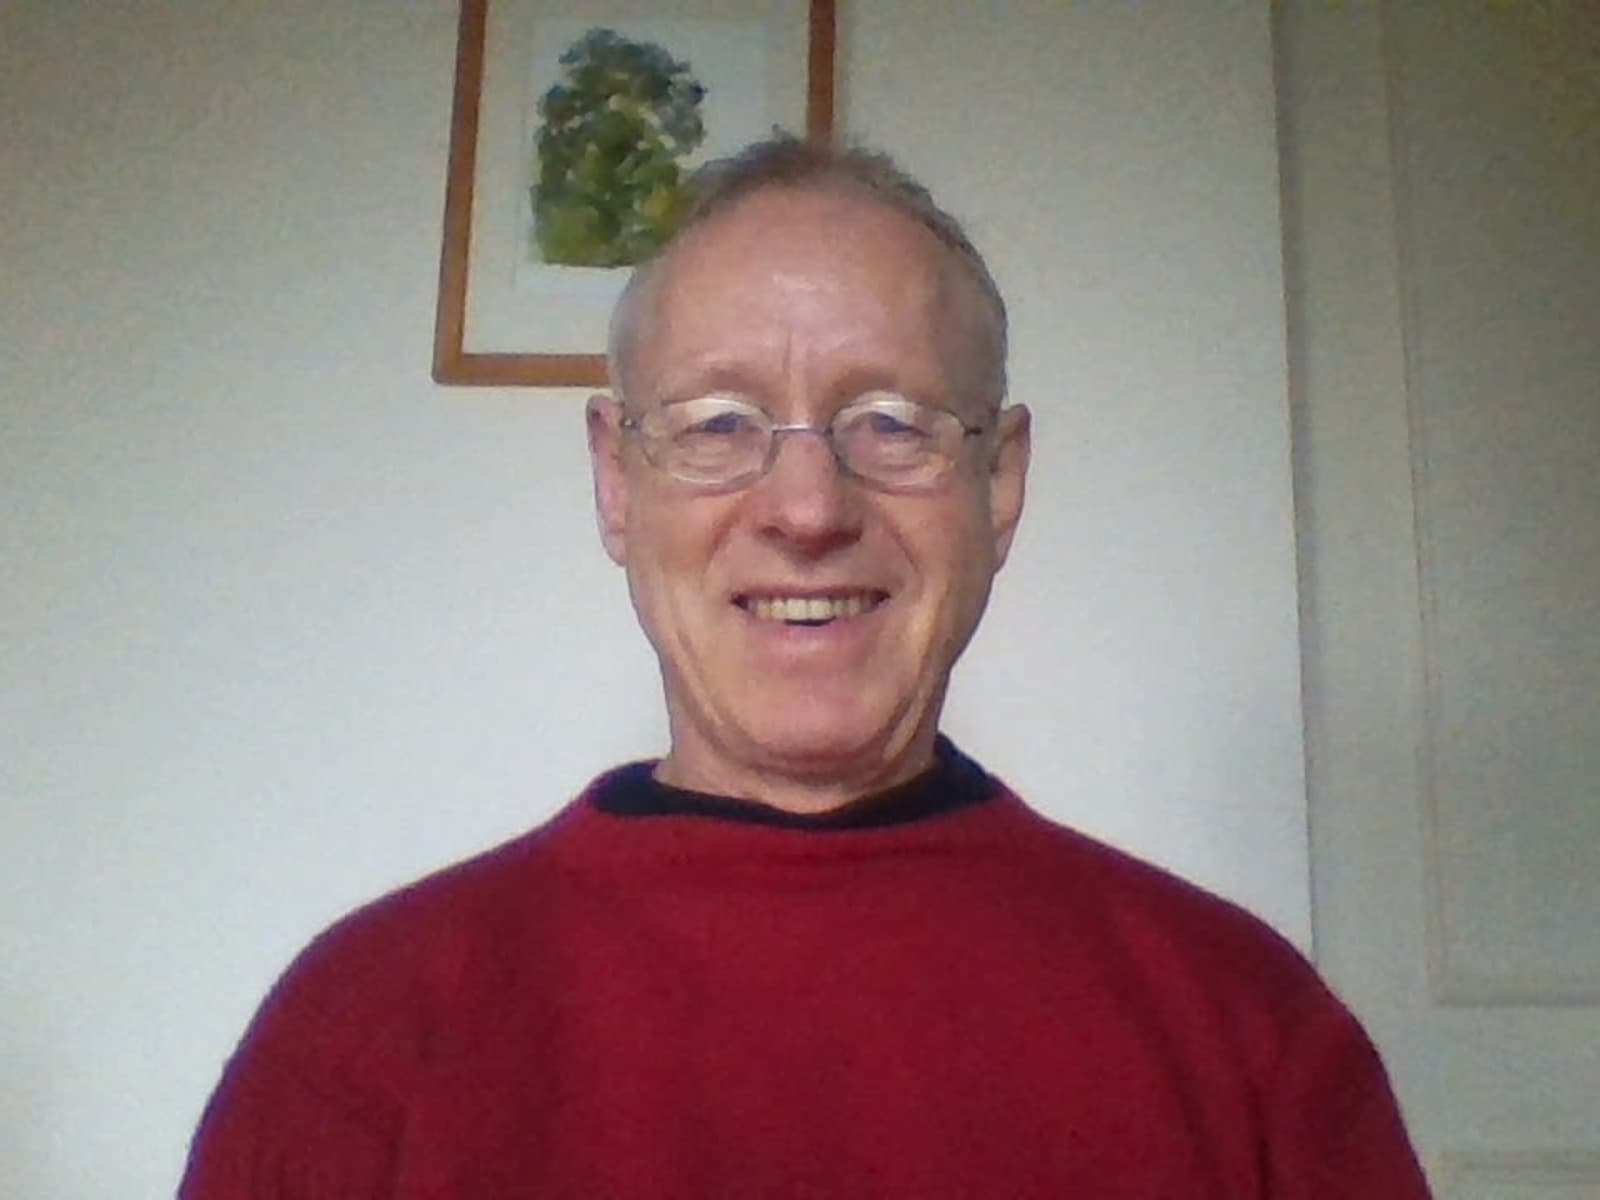 Peter from Loudéac, France